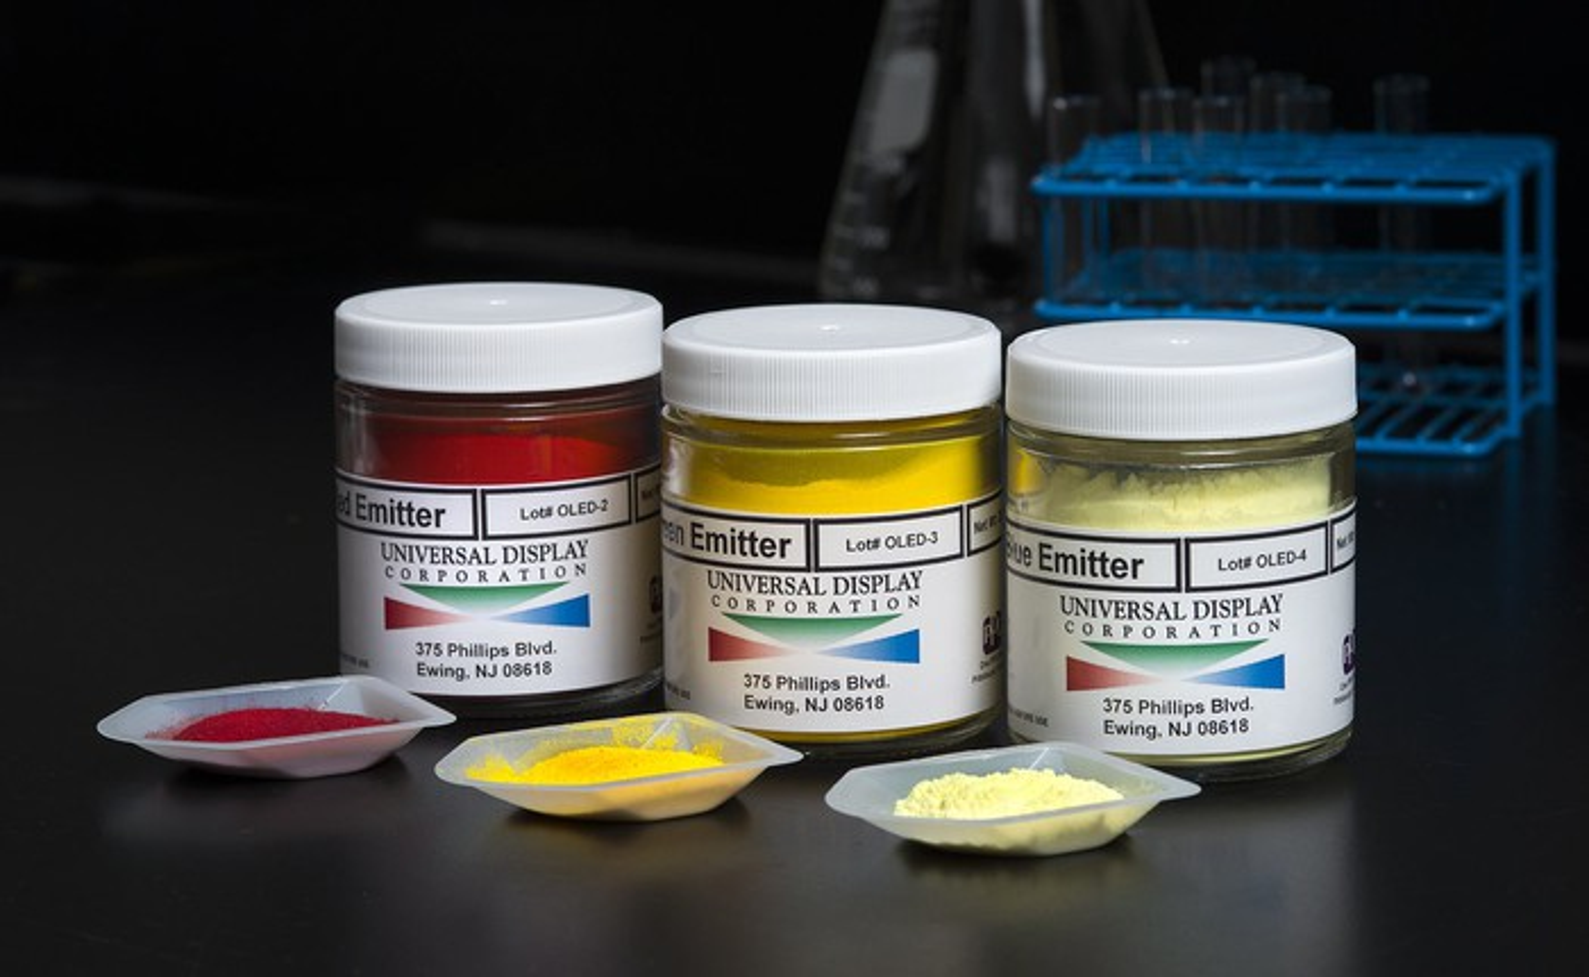 Three jars containing Universal Display's new OLED emitter materials